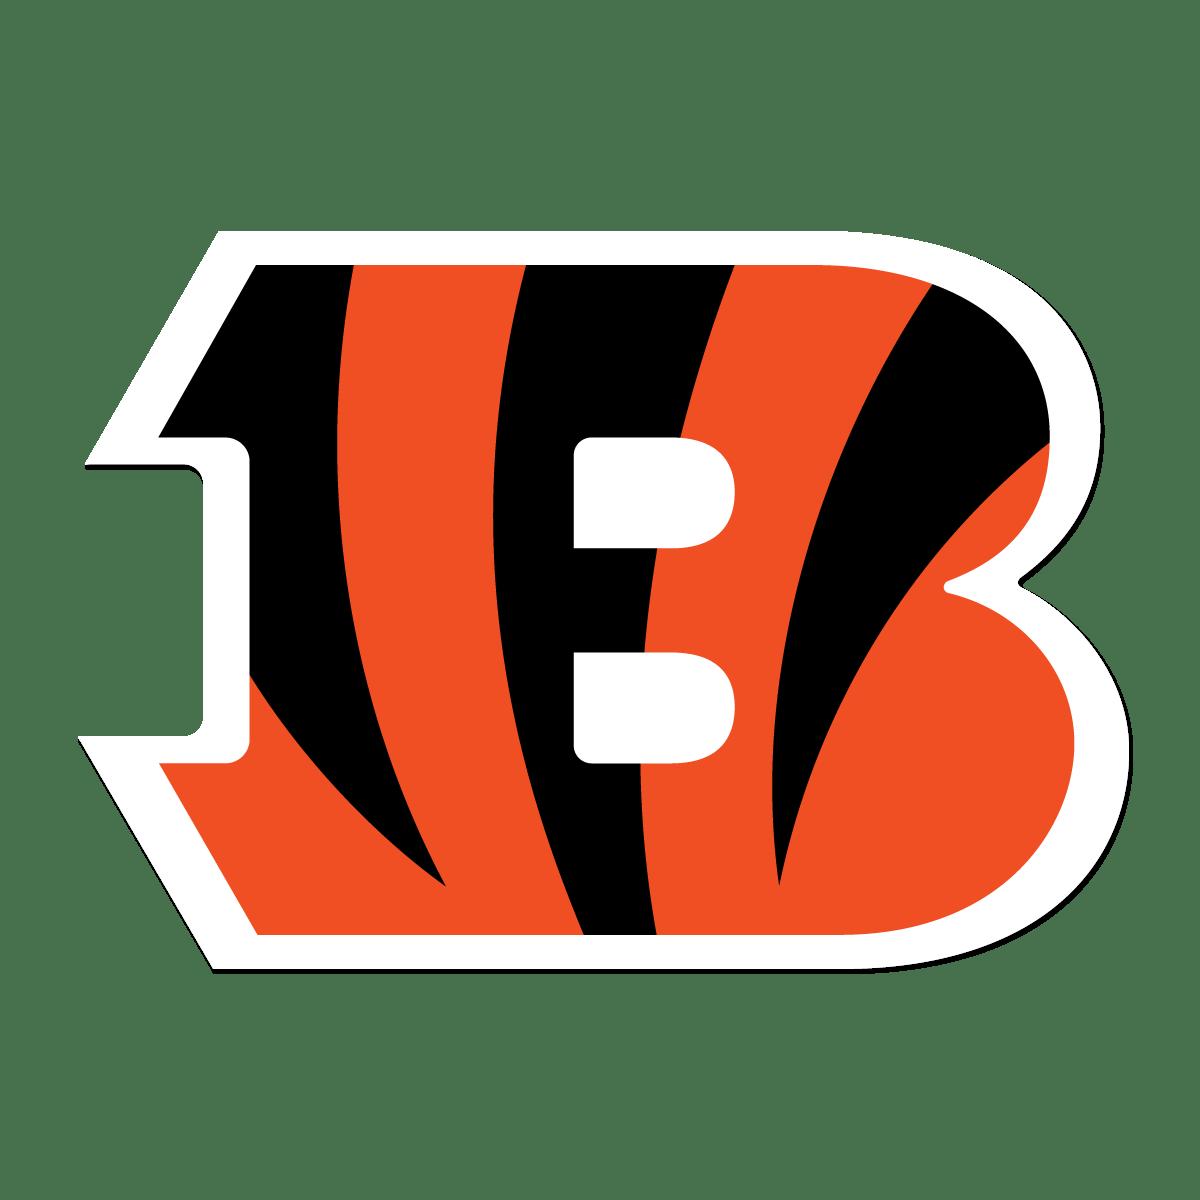 Image result for bengals logo transparent